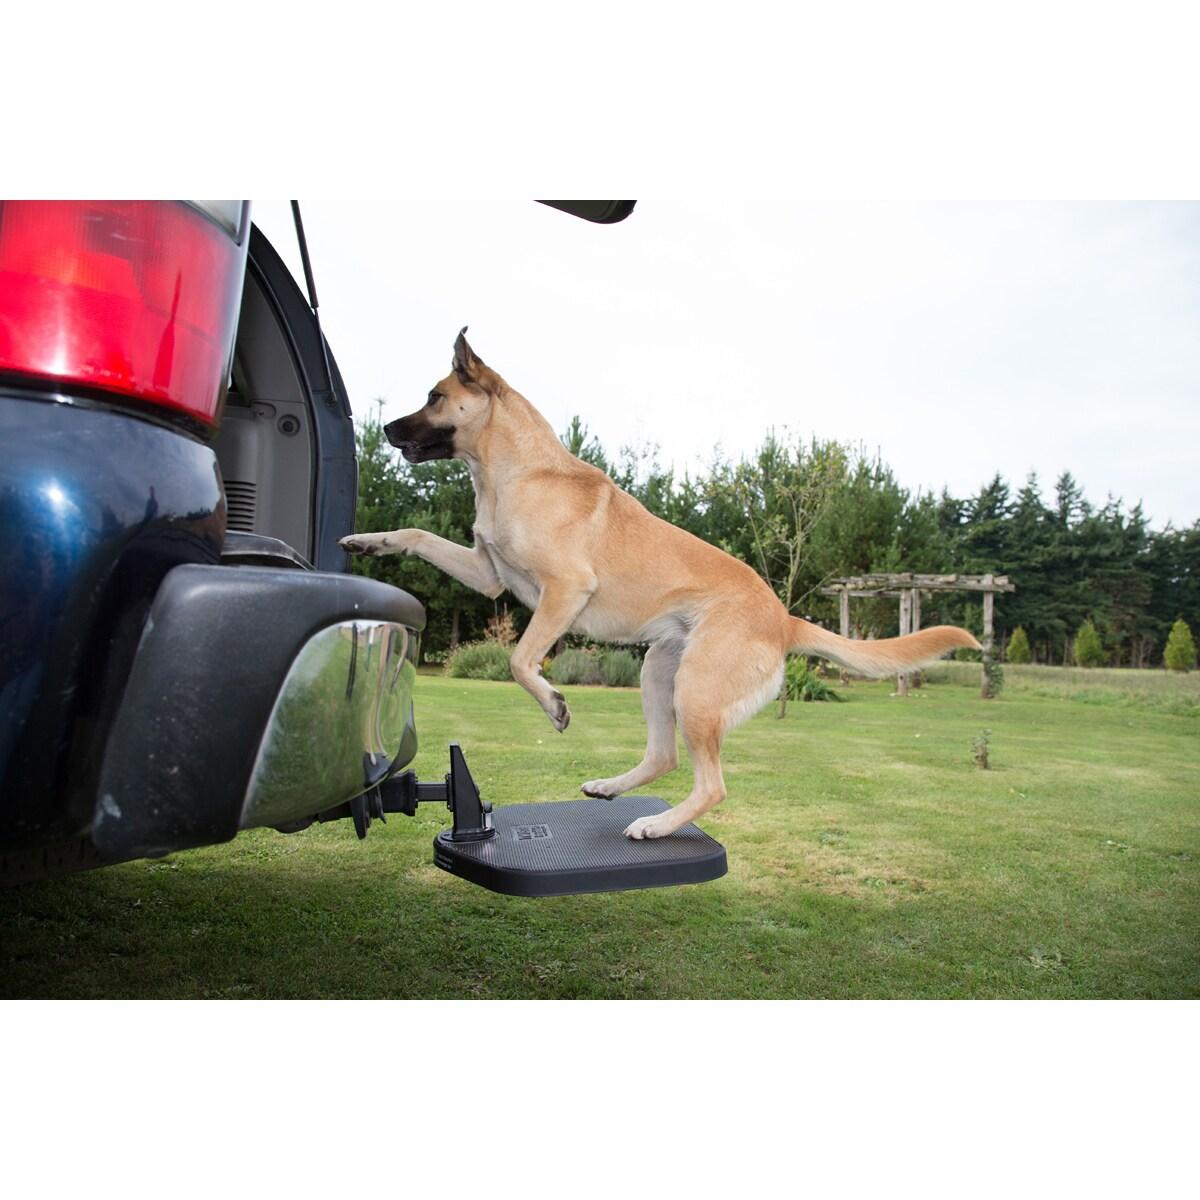 PortablePET Twistep SUV Dog Step (Twistep Dog Step), Blac...